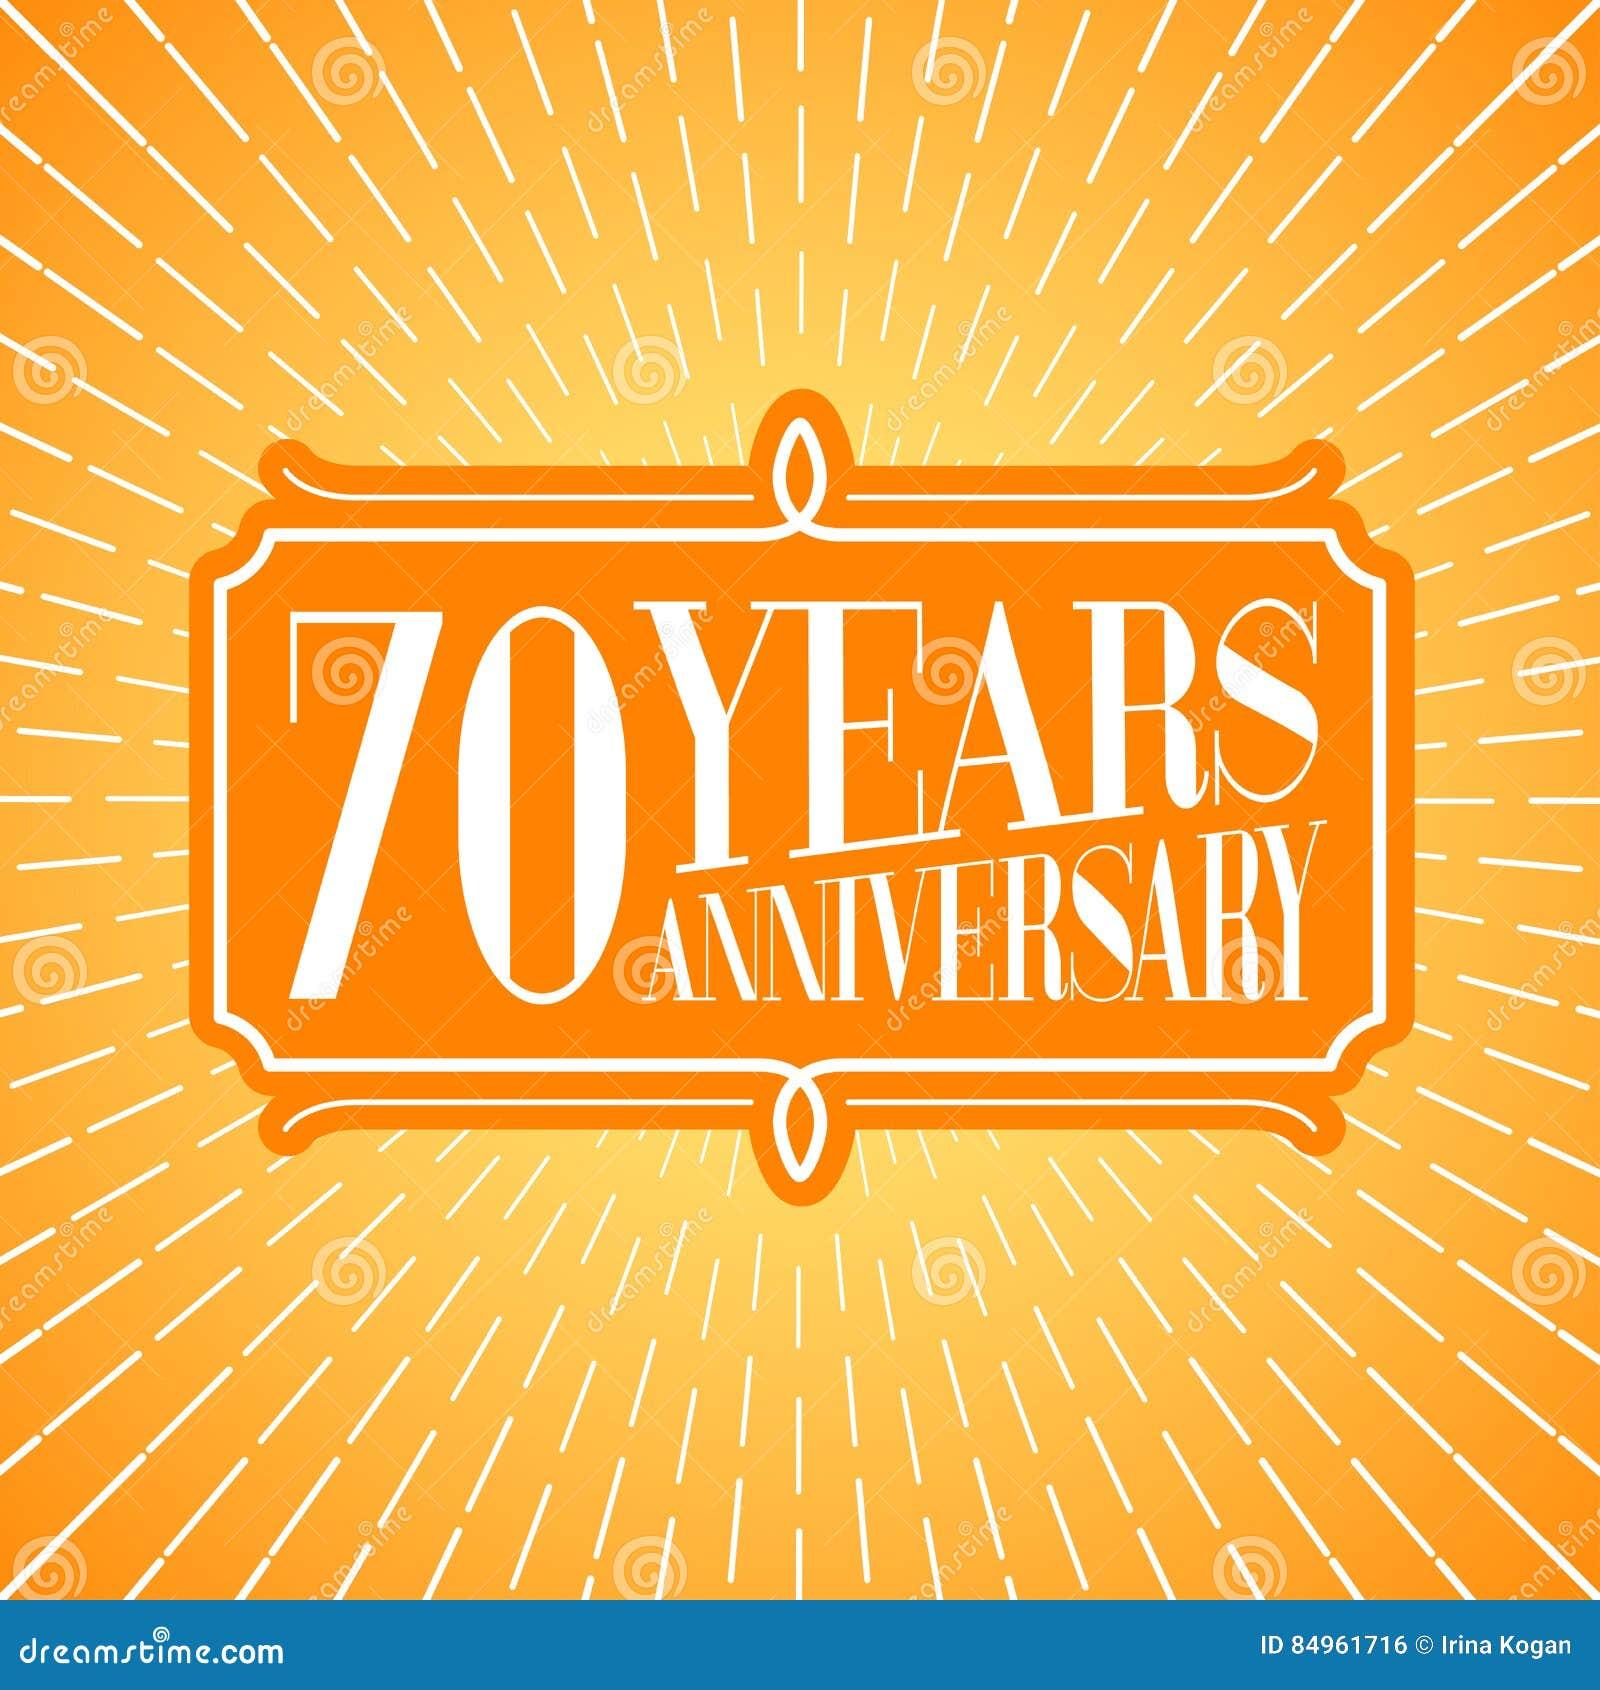 70 Years Anniversary Vector Icon Logo Stock Illustration